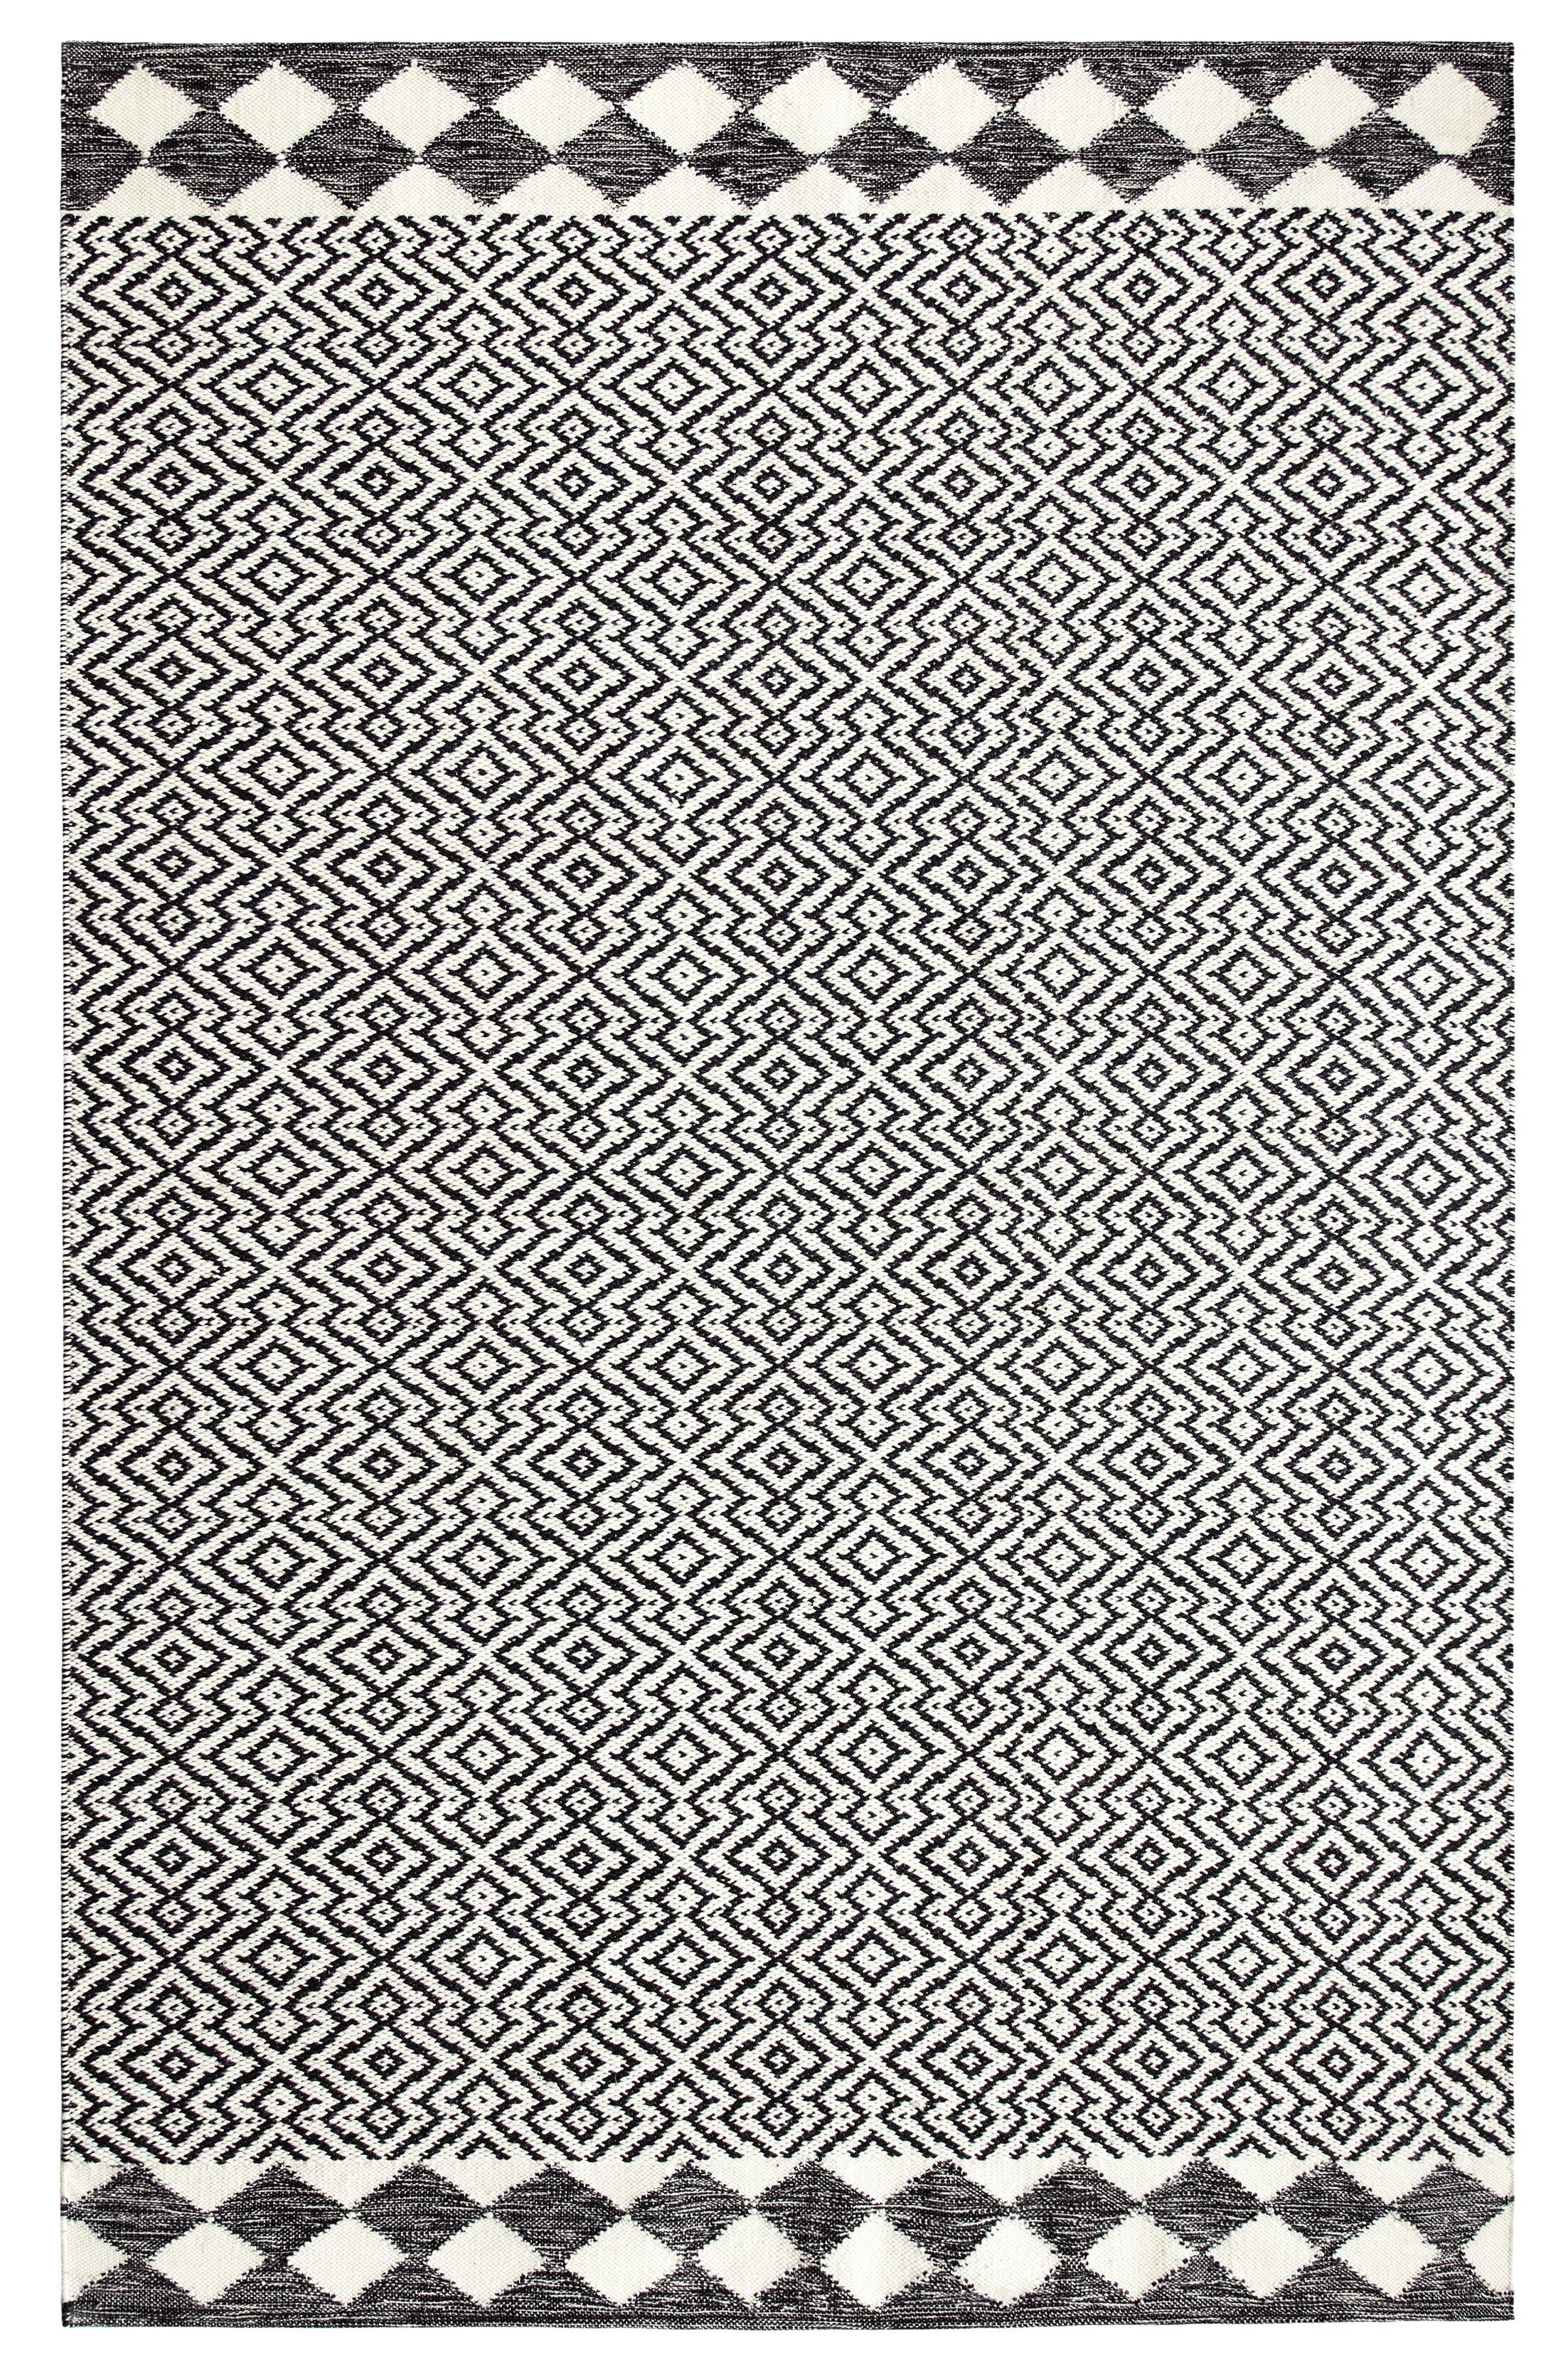 Odeon Hand-Woven Black Indoor/Outdoor Area Rug Rug Size: Rectangle 5' x 8'